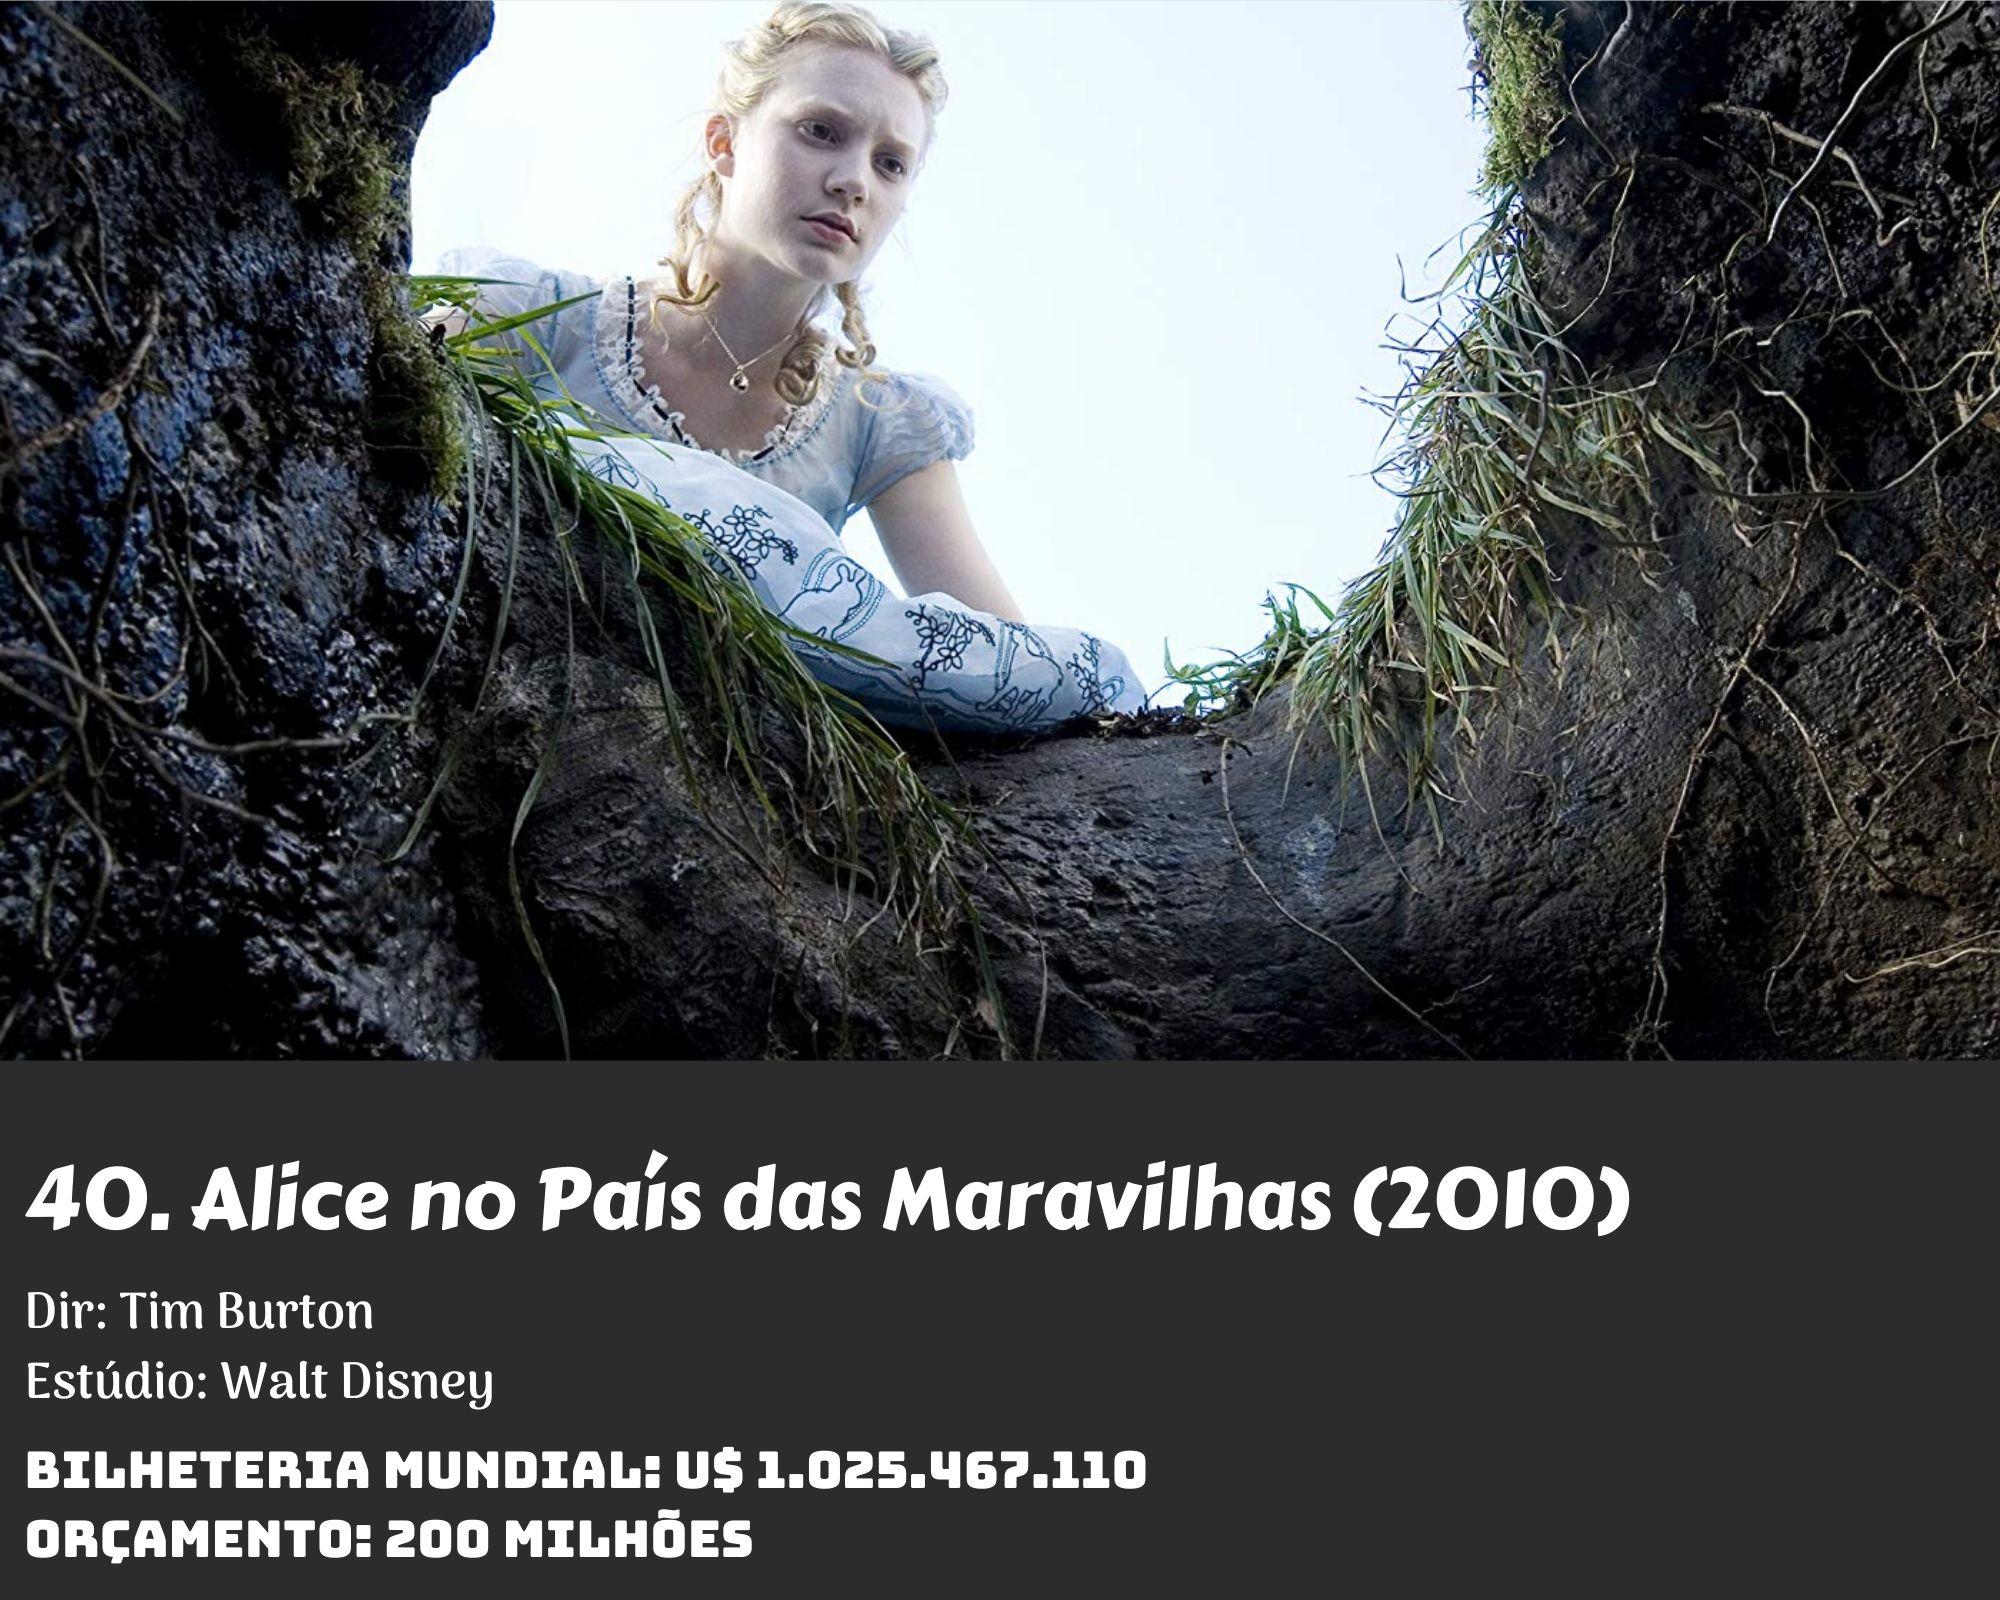 40. Alice in Wonderland